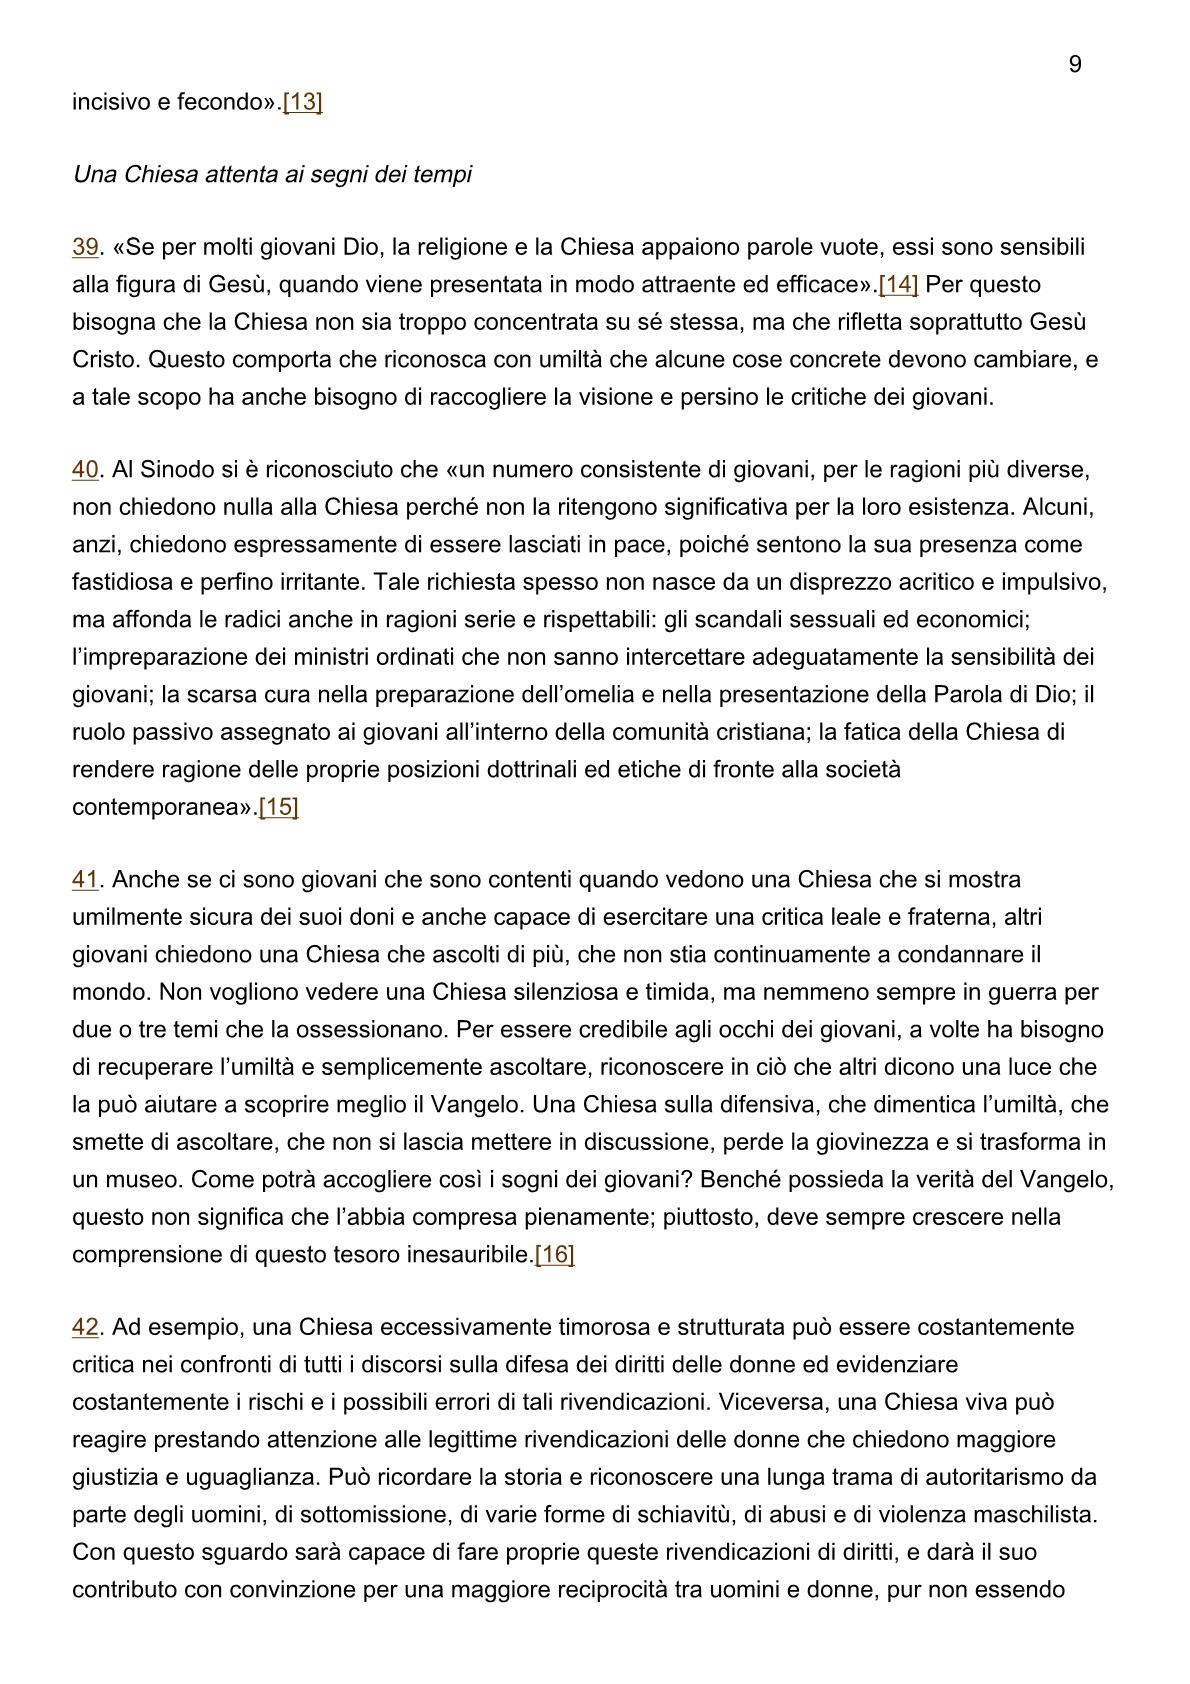 papa-francesco_esortazione-ap_20190325_christus-vivit9